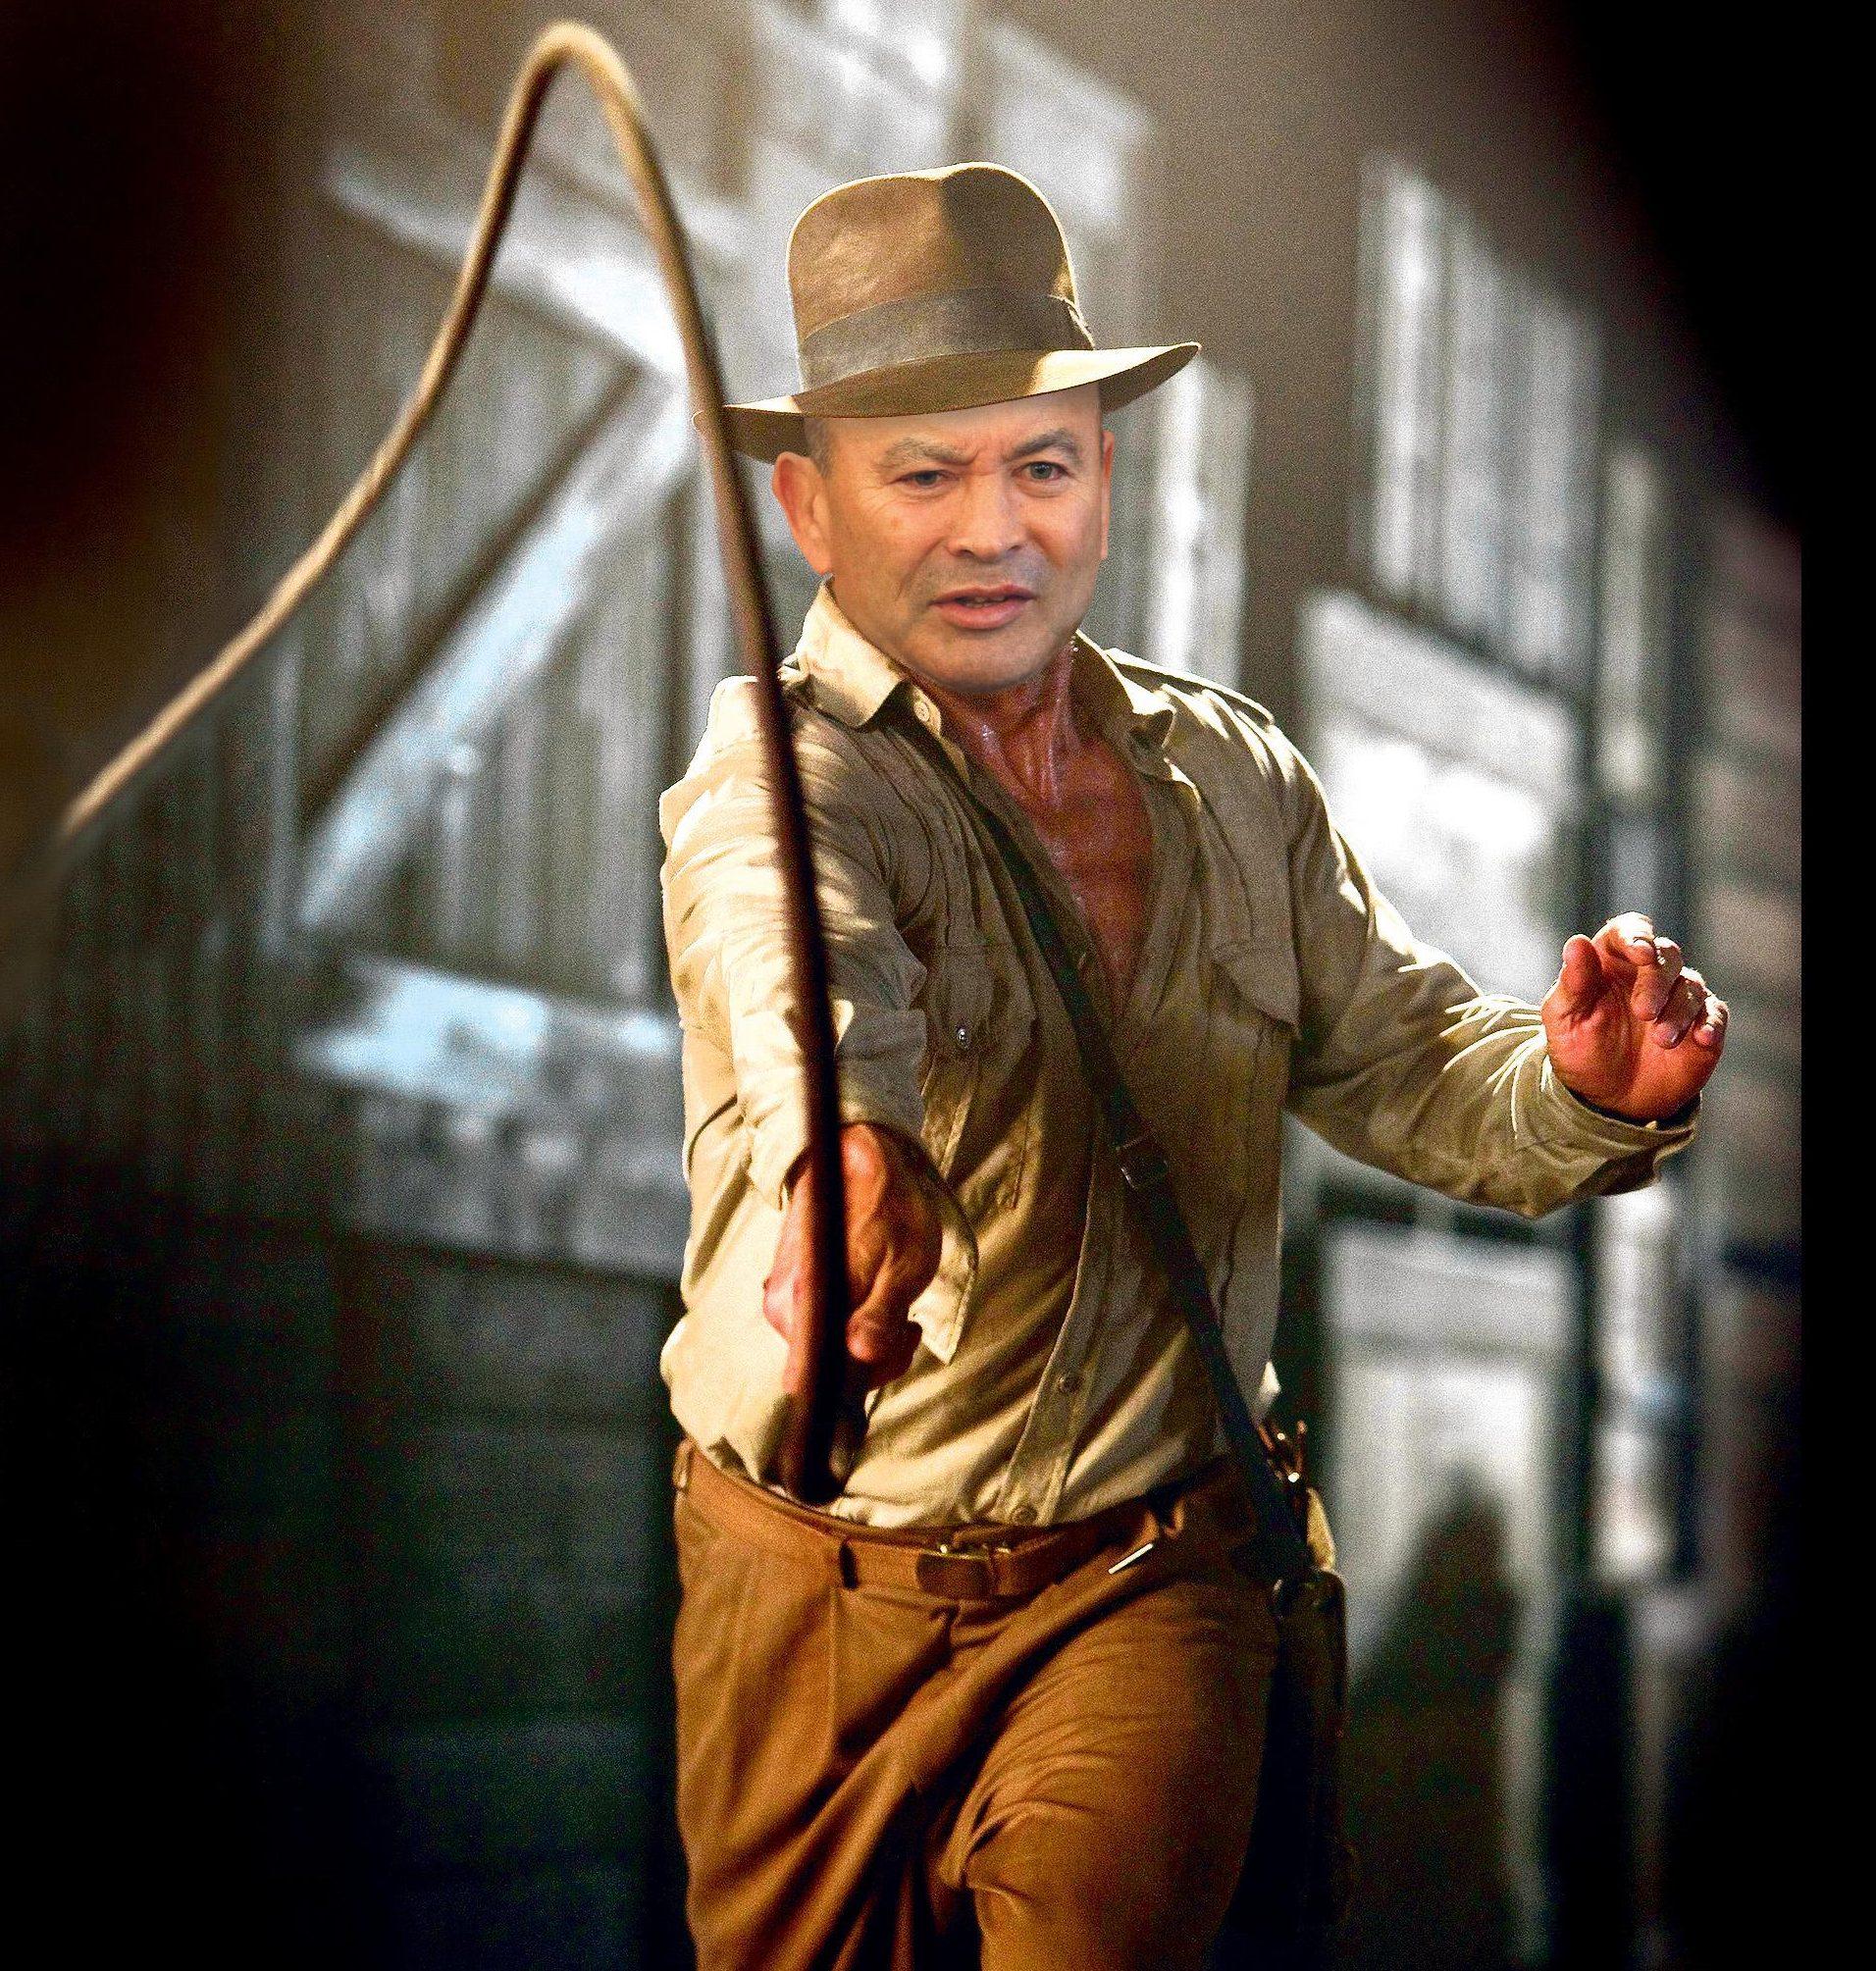 Eddie Jones wants a blockbuster on a level with Indiana Jones